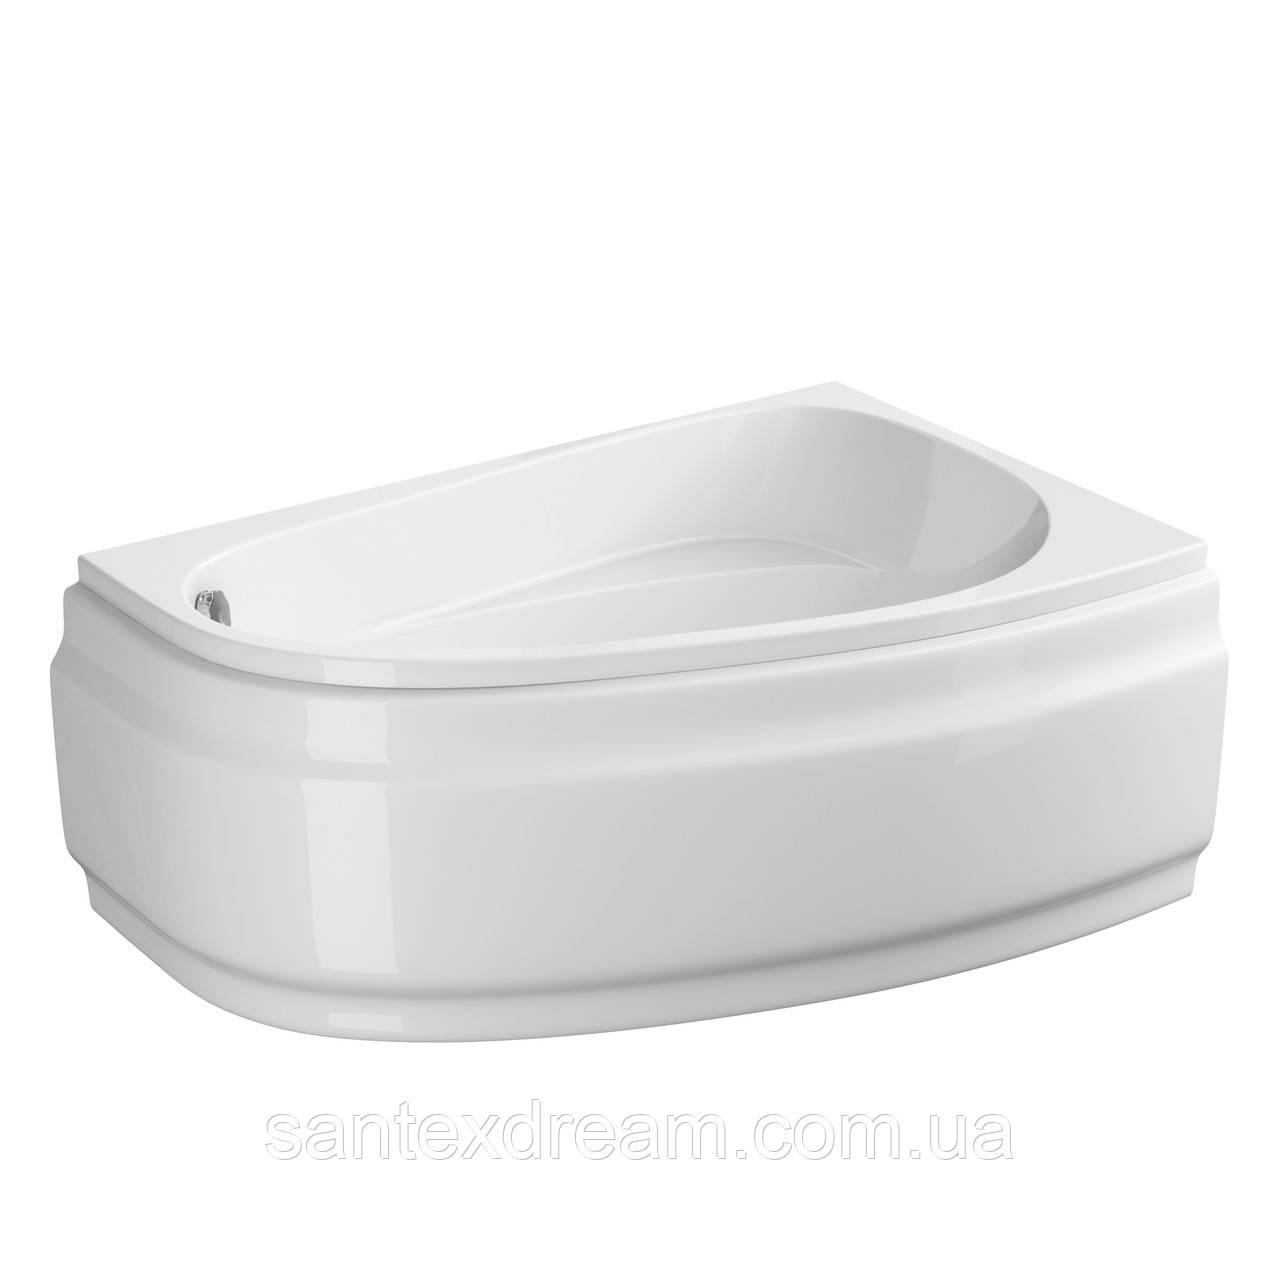 Ванна Cersanit Joanna New 140 X 90 асимметричная правая S301-166